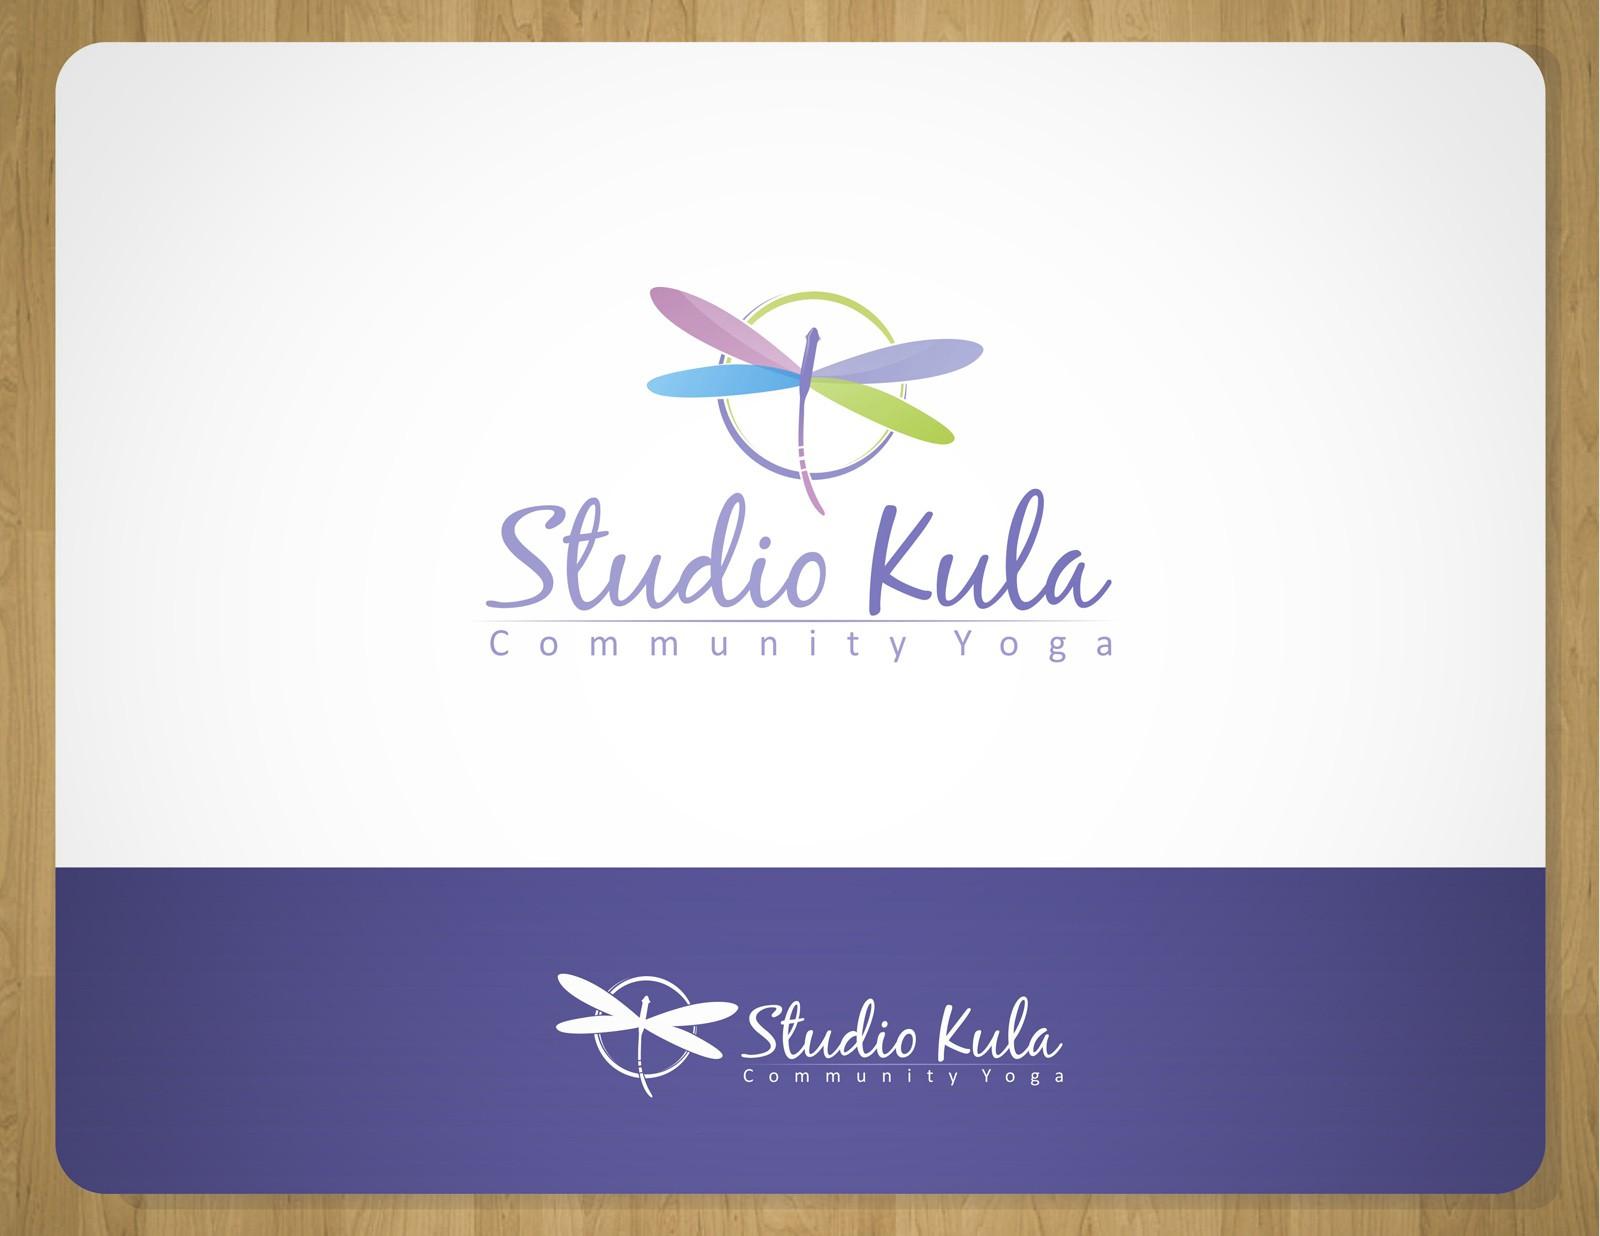 Studio Kula needs a new logo